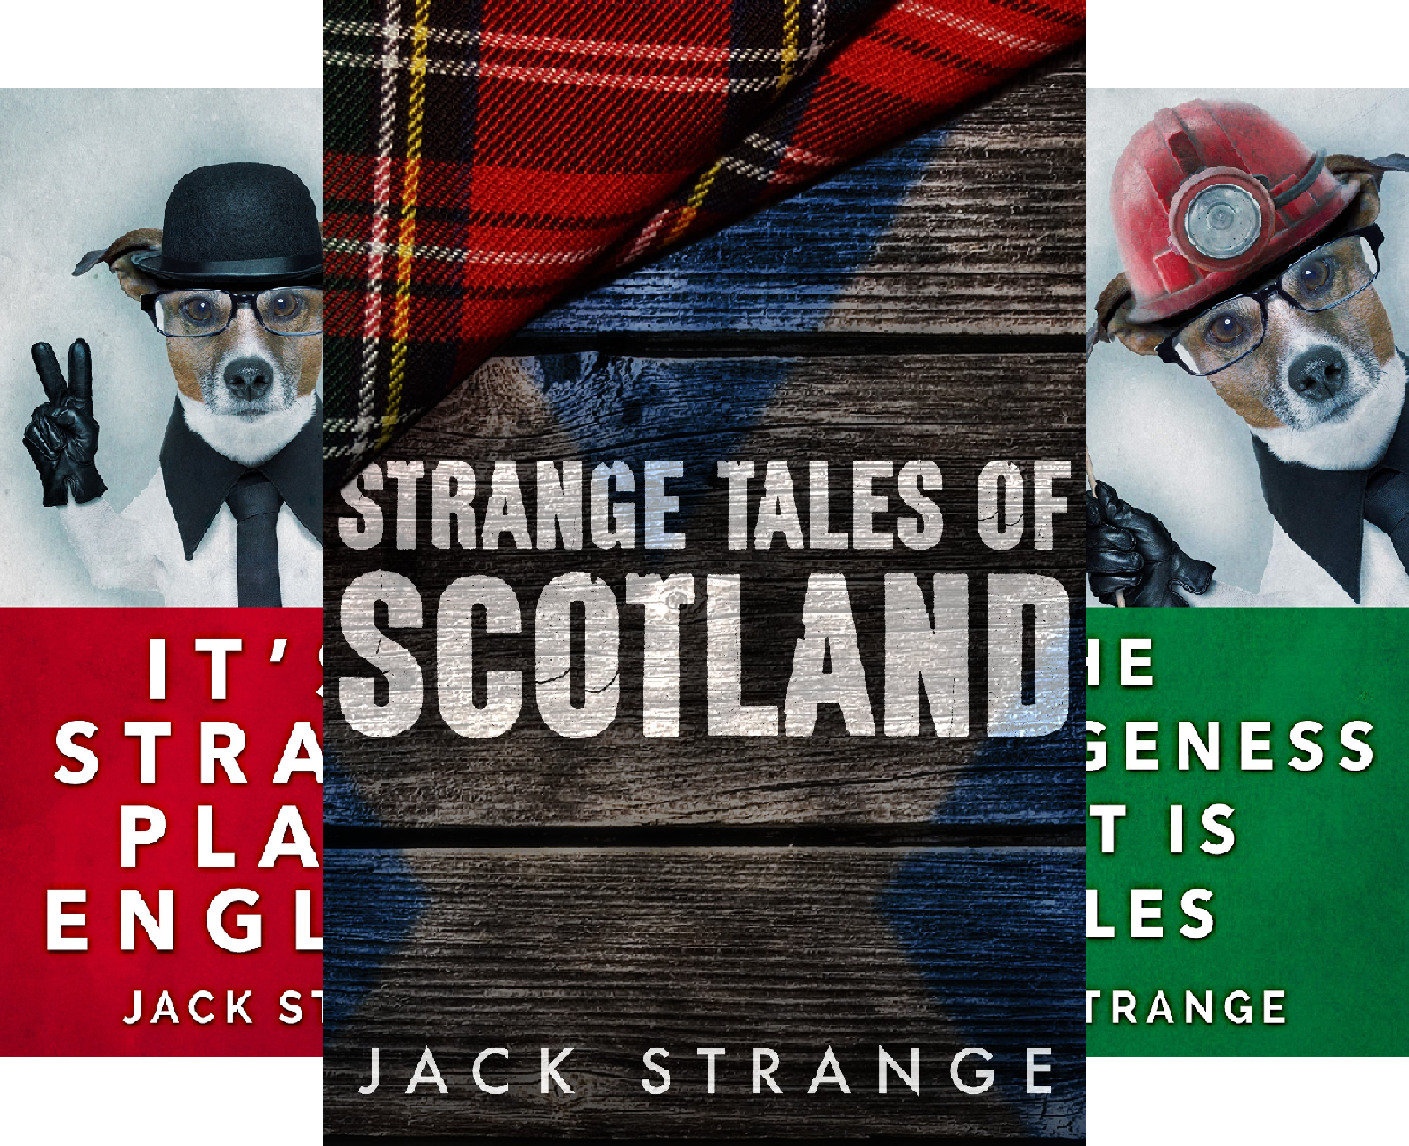 Jack's Strange Tales (5 Book Series)